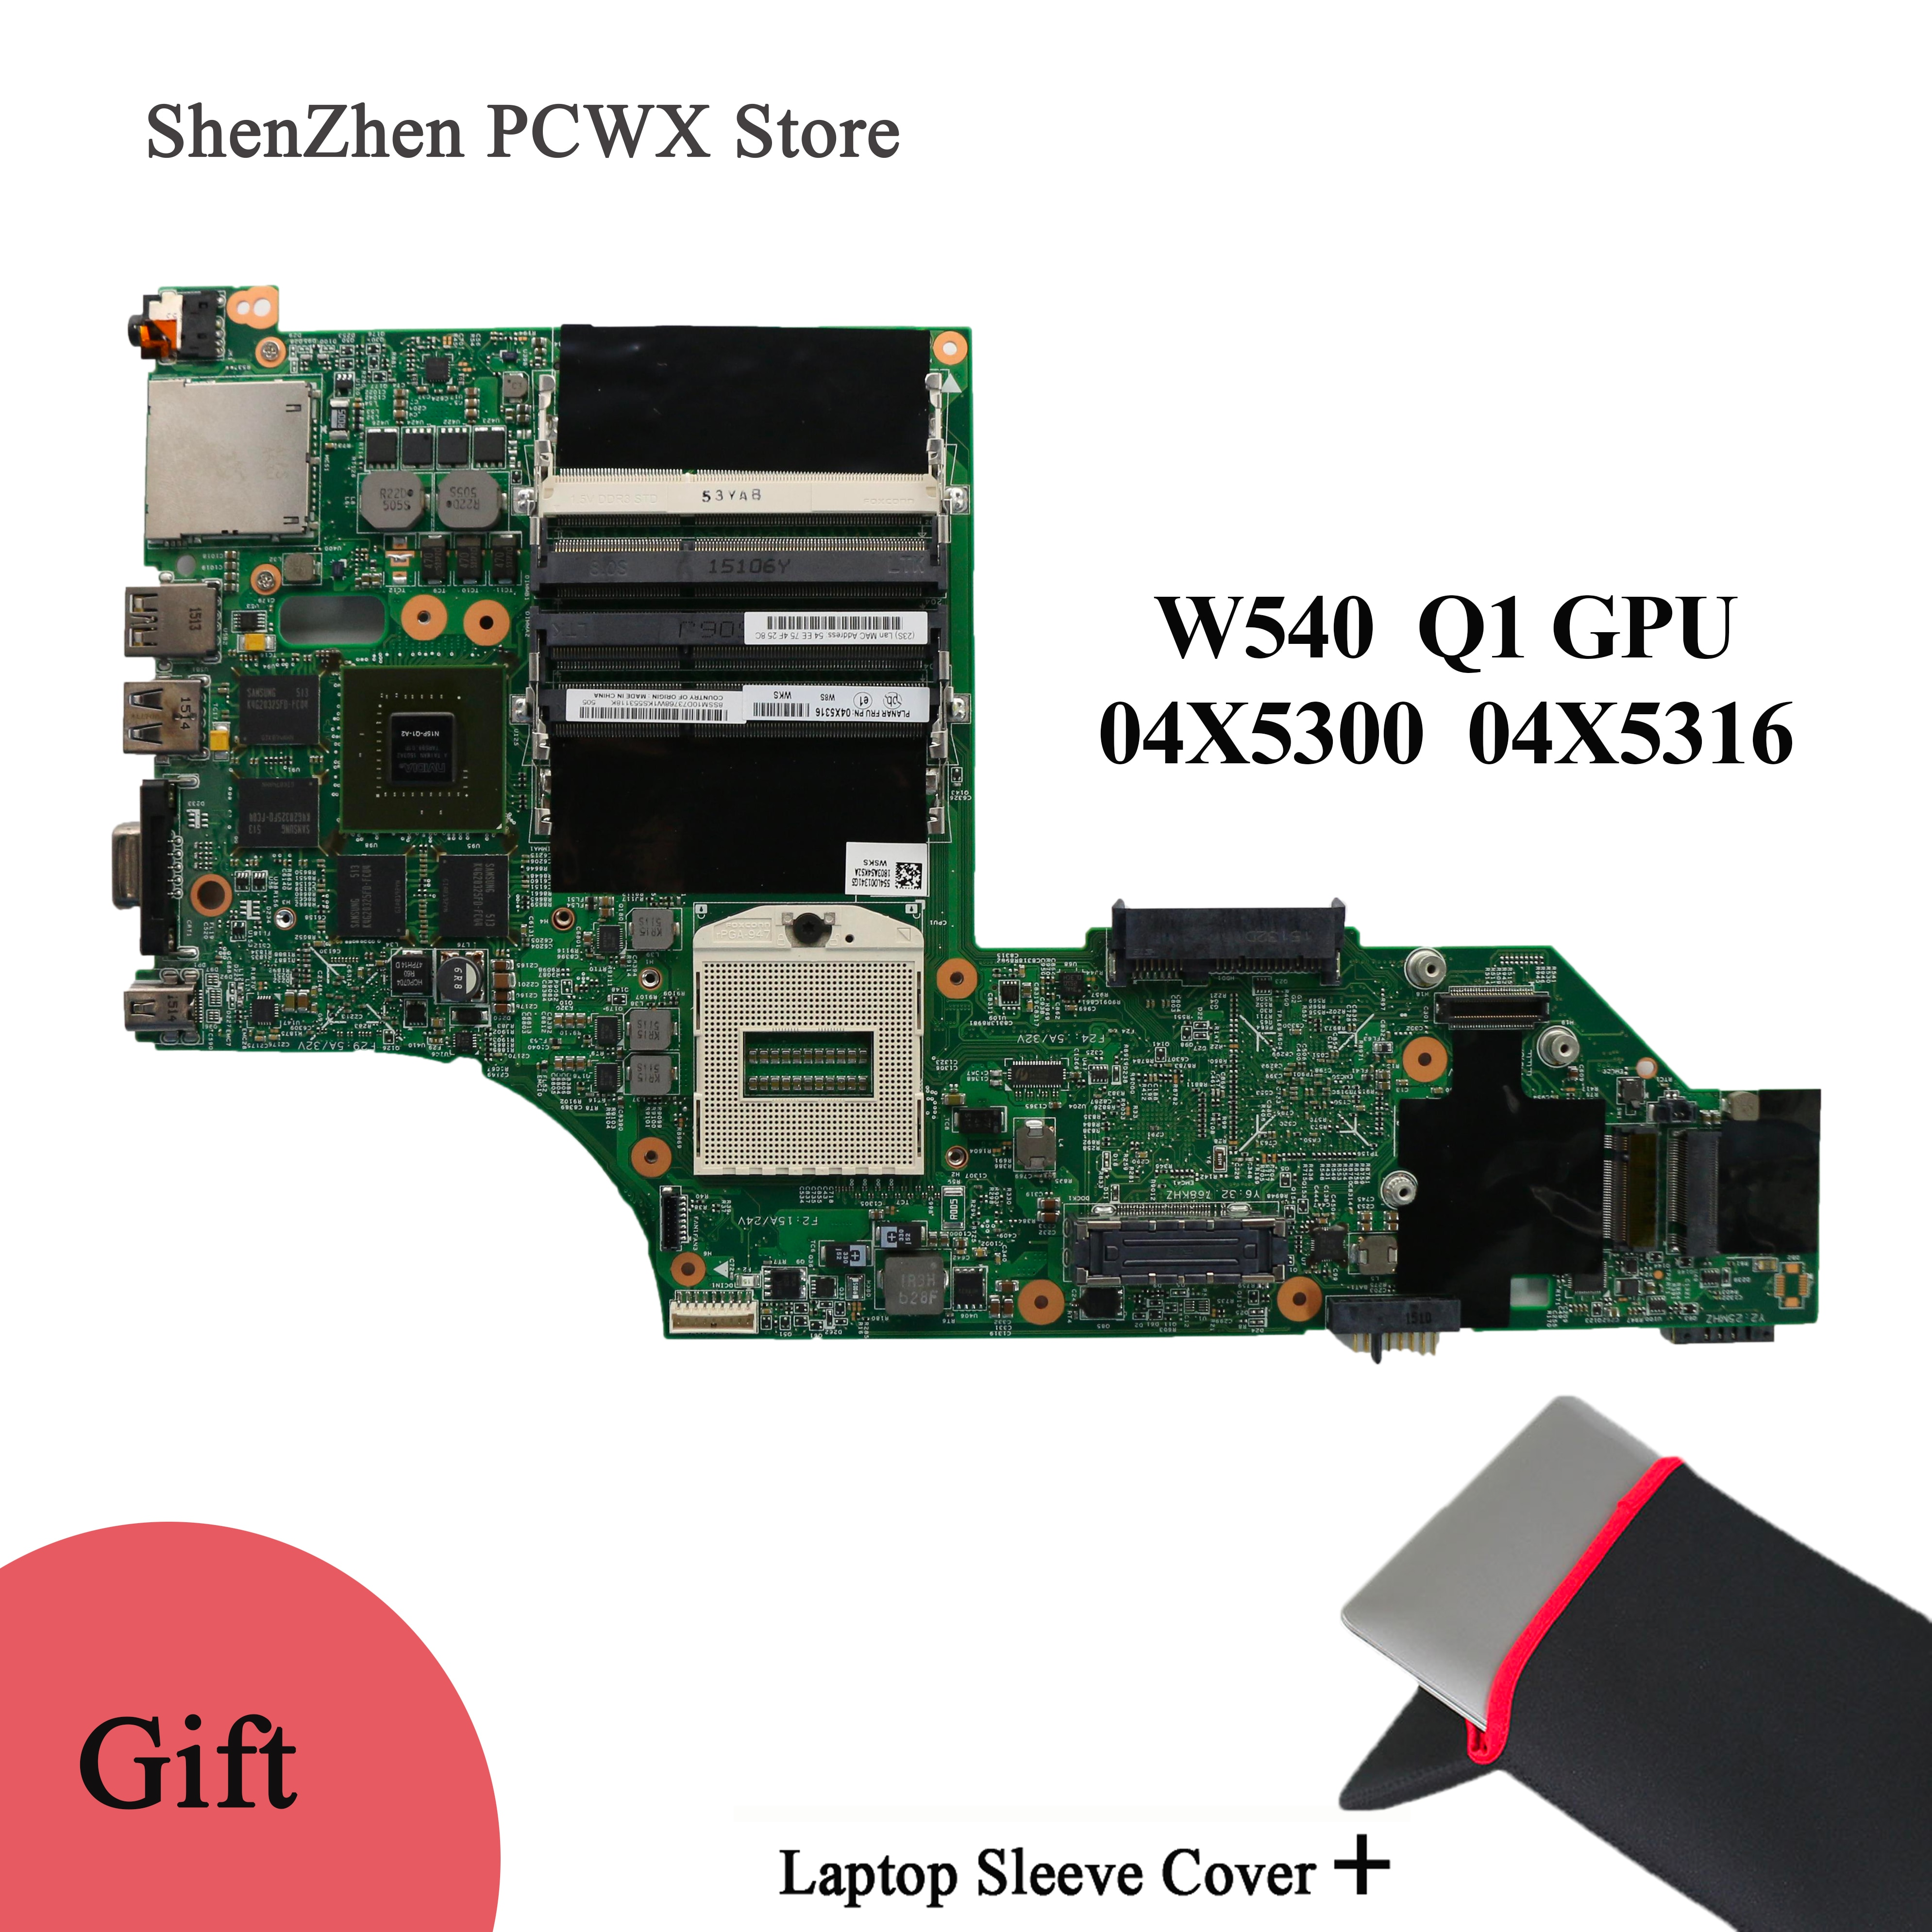 Para Lenovo thinkpad W540 04X5300 04X5316 portátil tarjeta madre de vídeo independiente LKM-1 WS MB 12291-2 48.4LO13.021 con GPU Q1